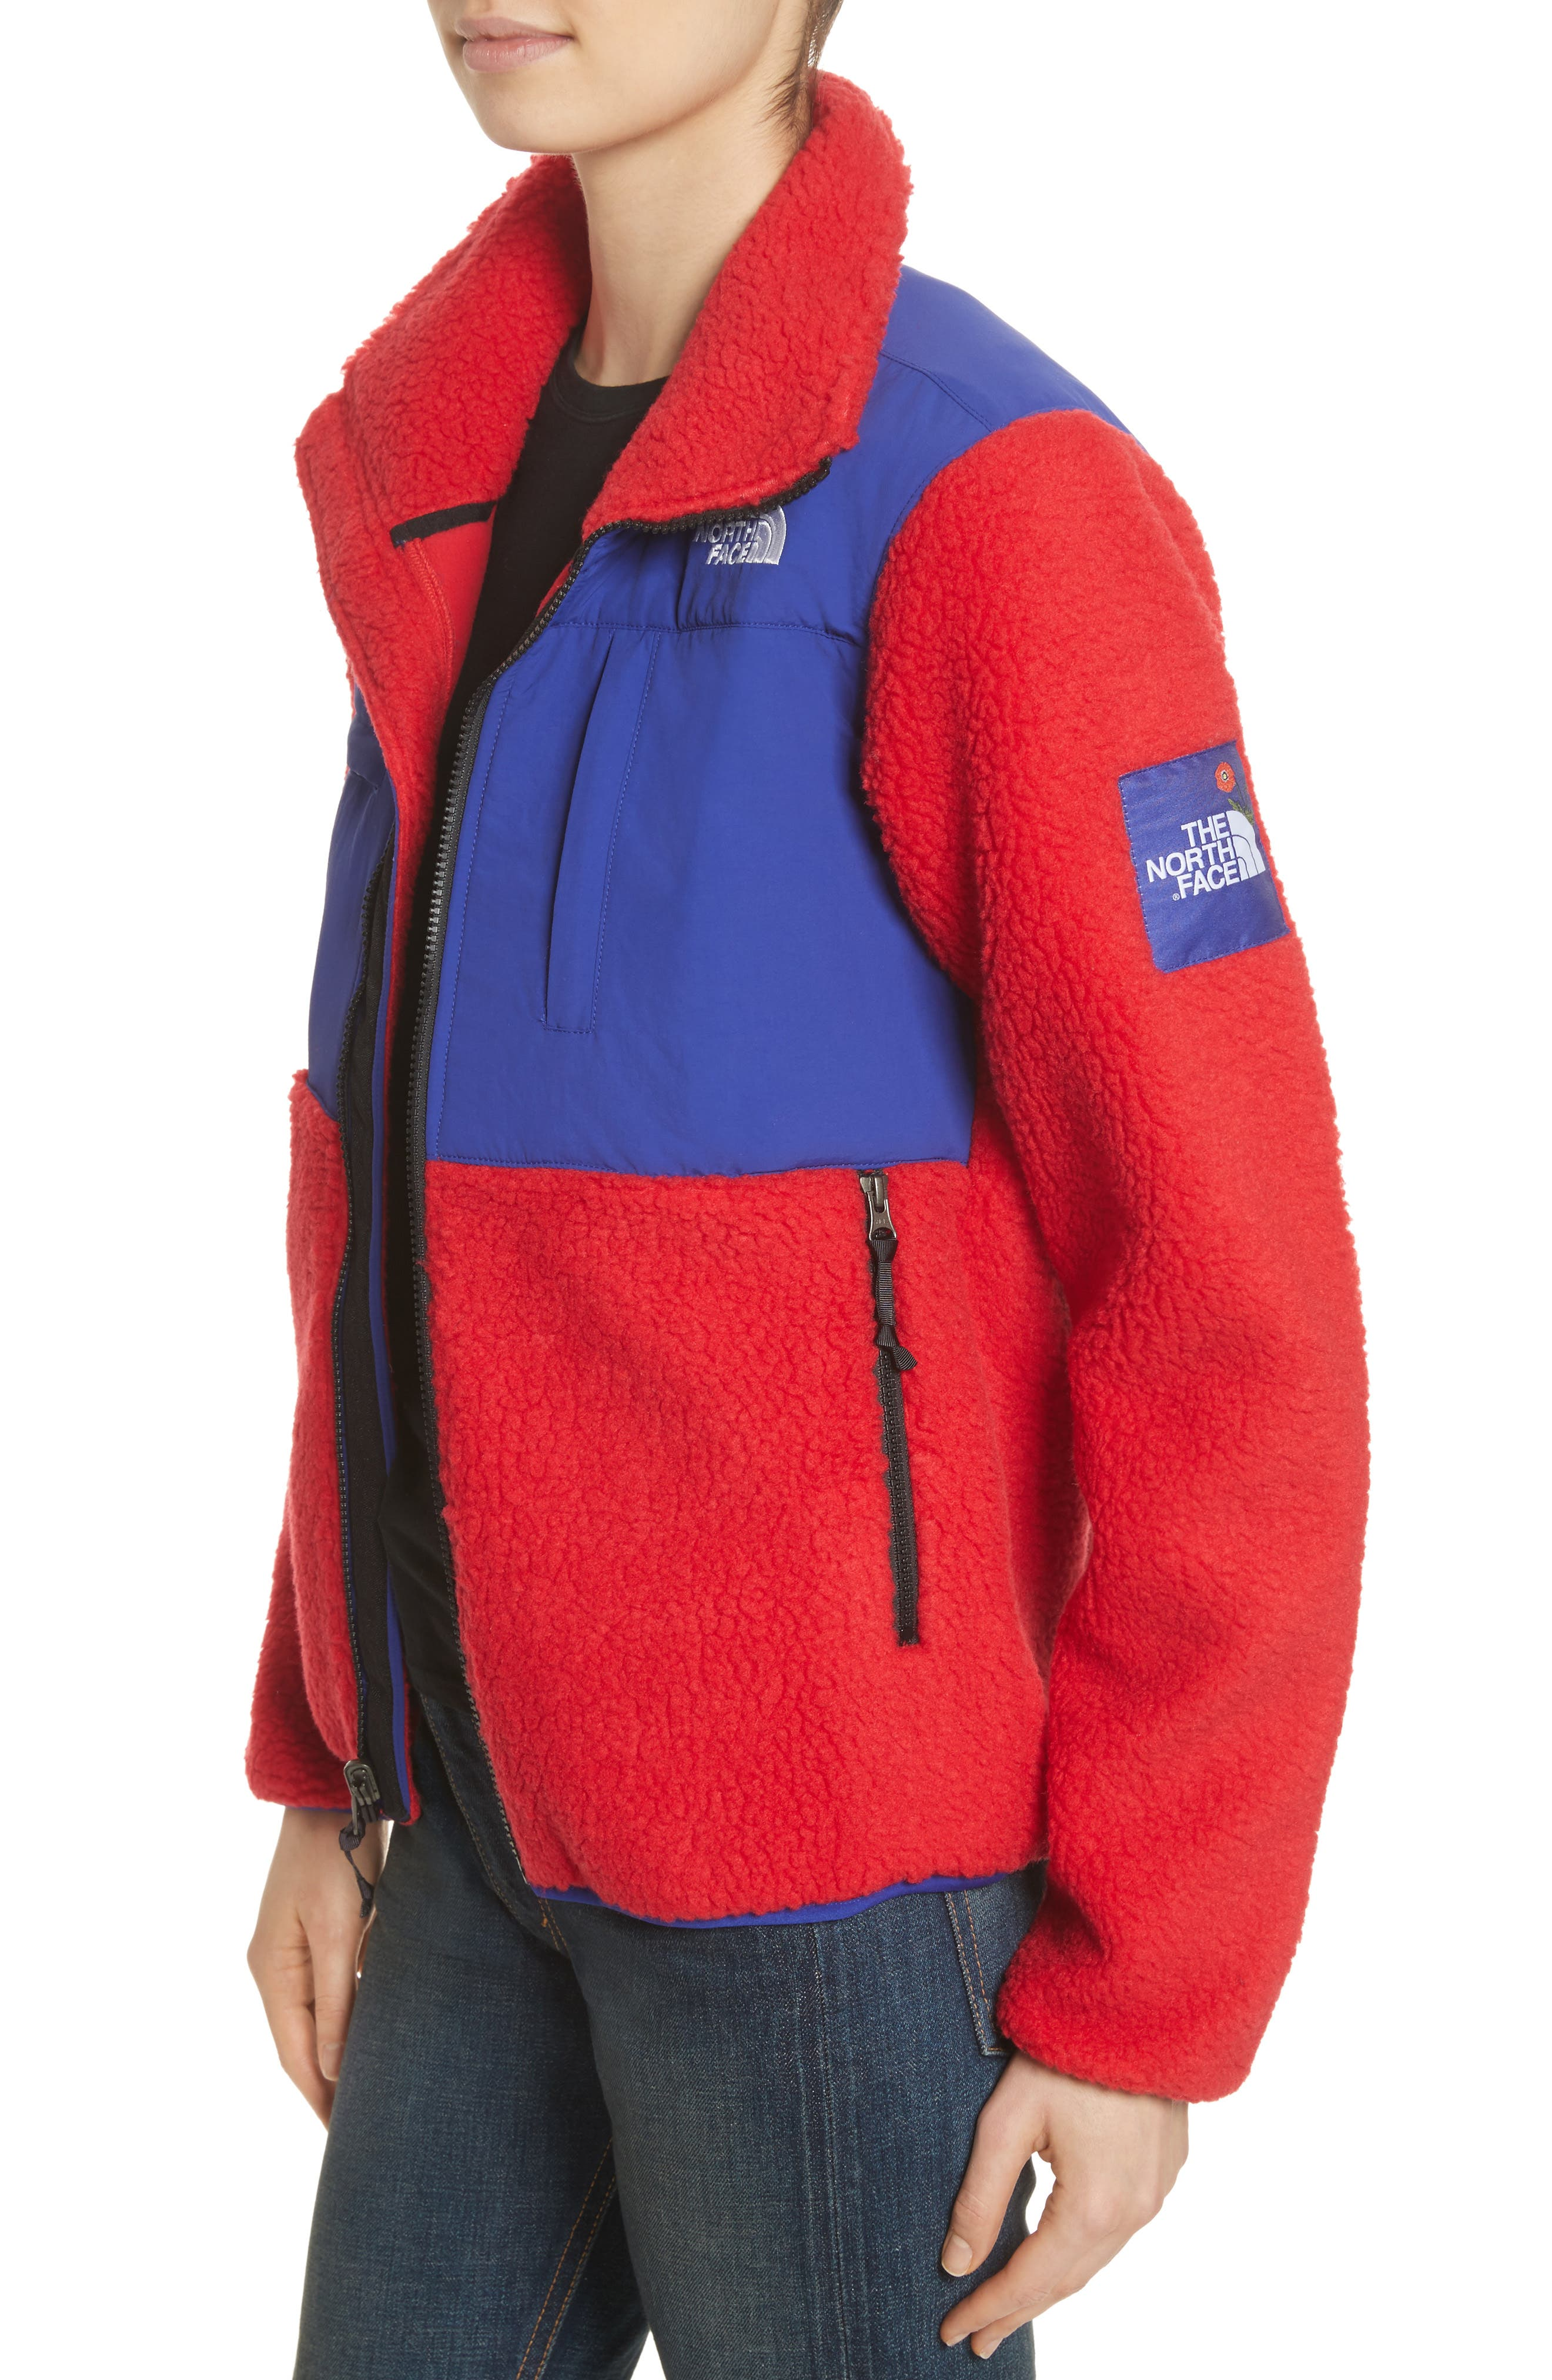 Denali Jacket,                             Alternate thumbnail 5, color,                             Tnf Red